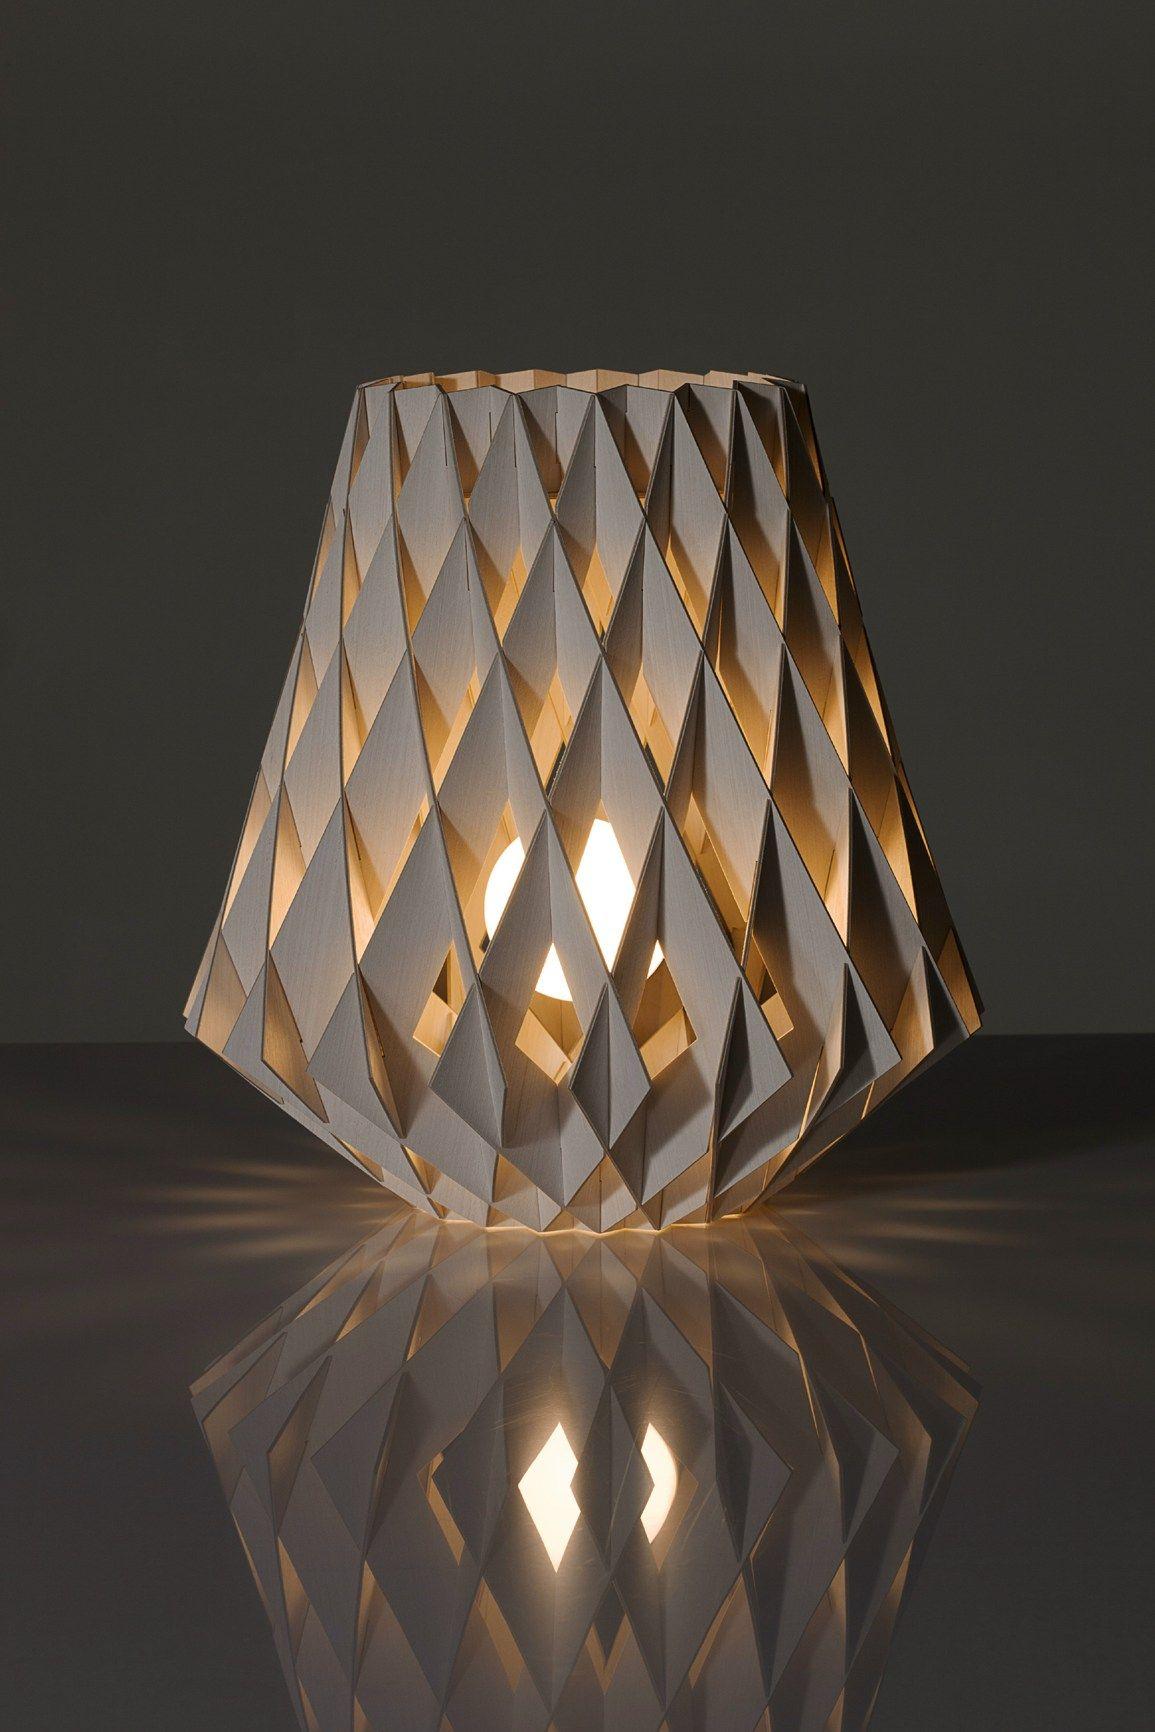 plywood lighting. Plywood Lighting D